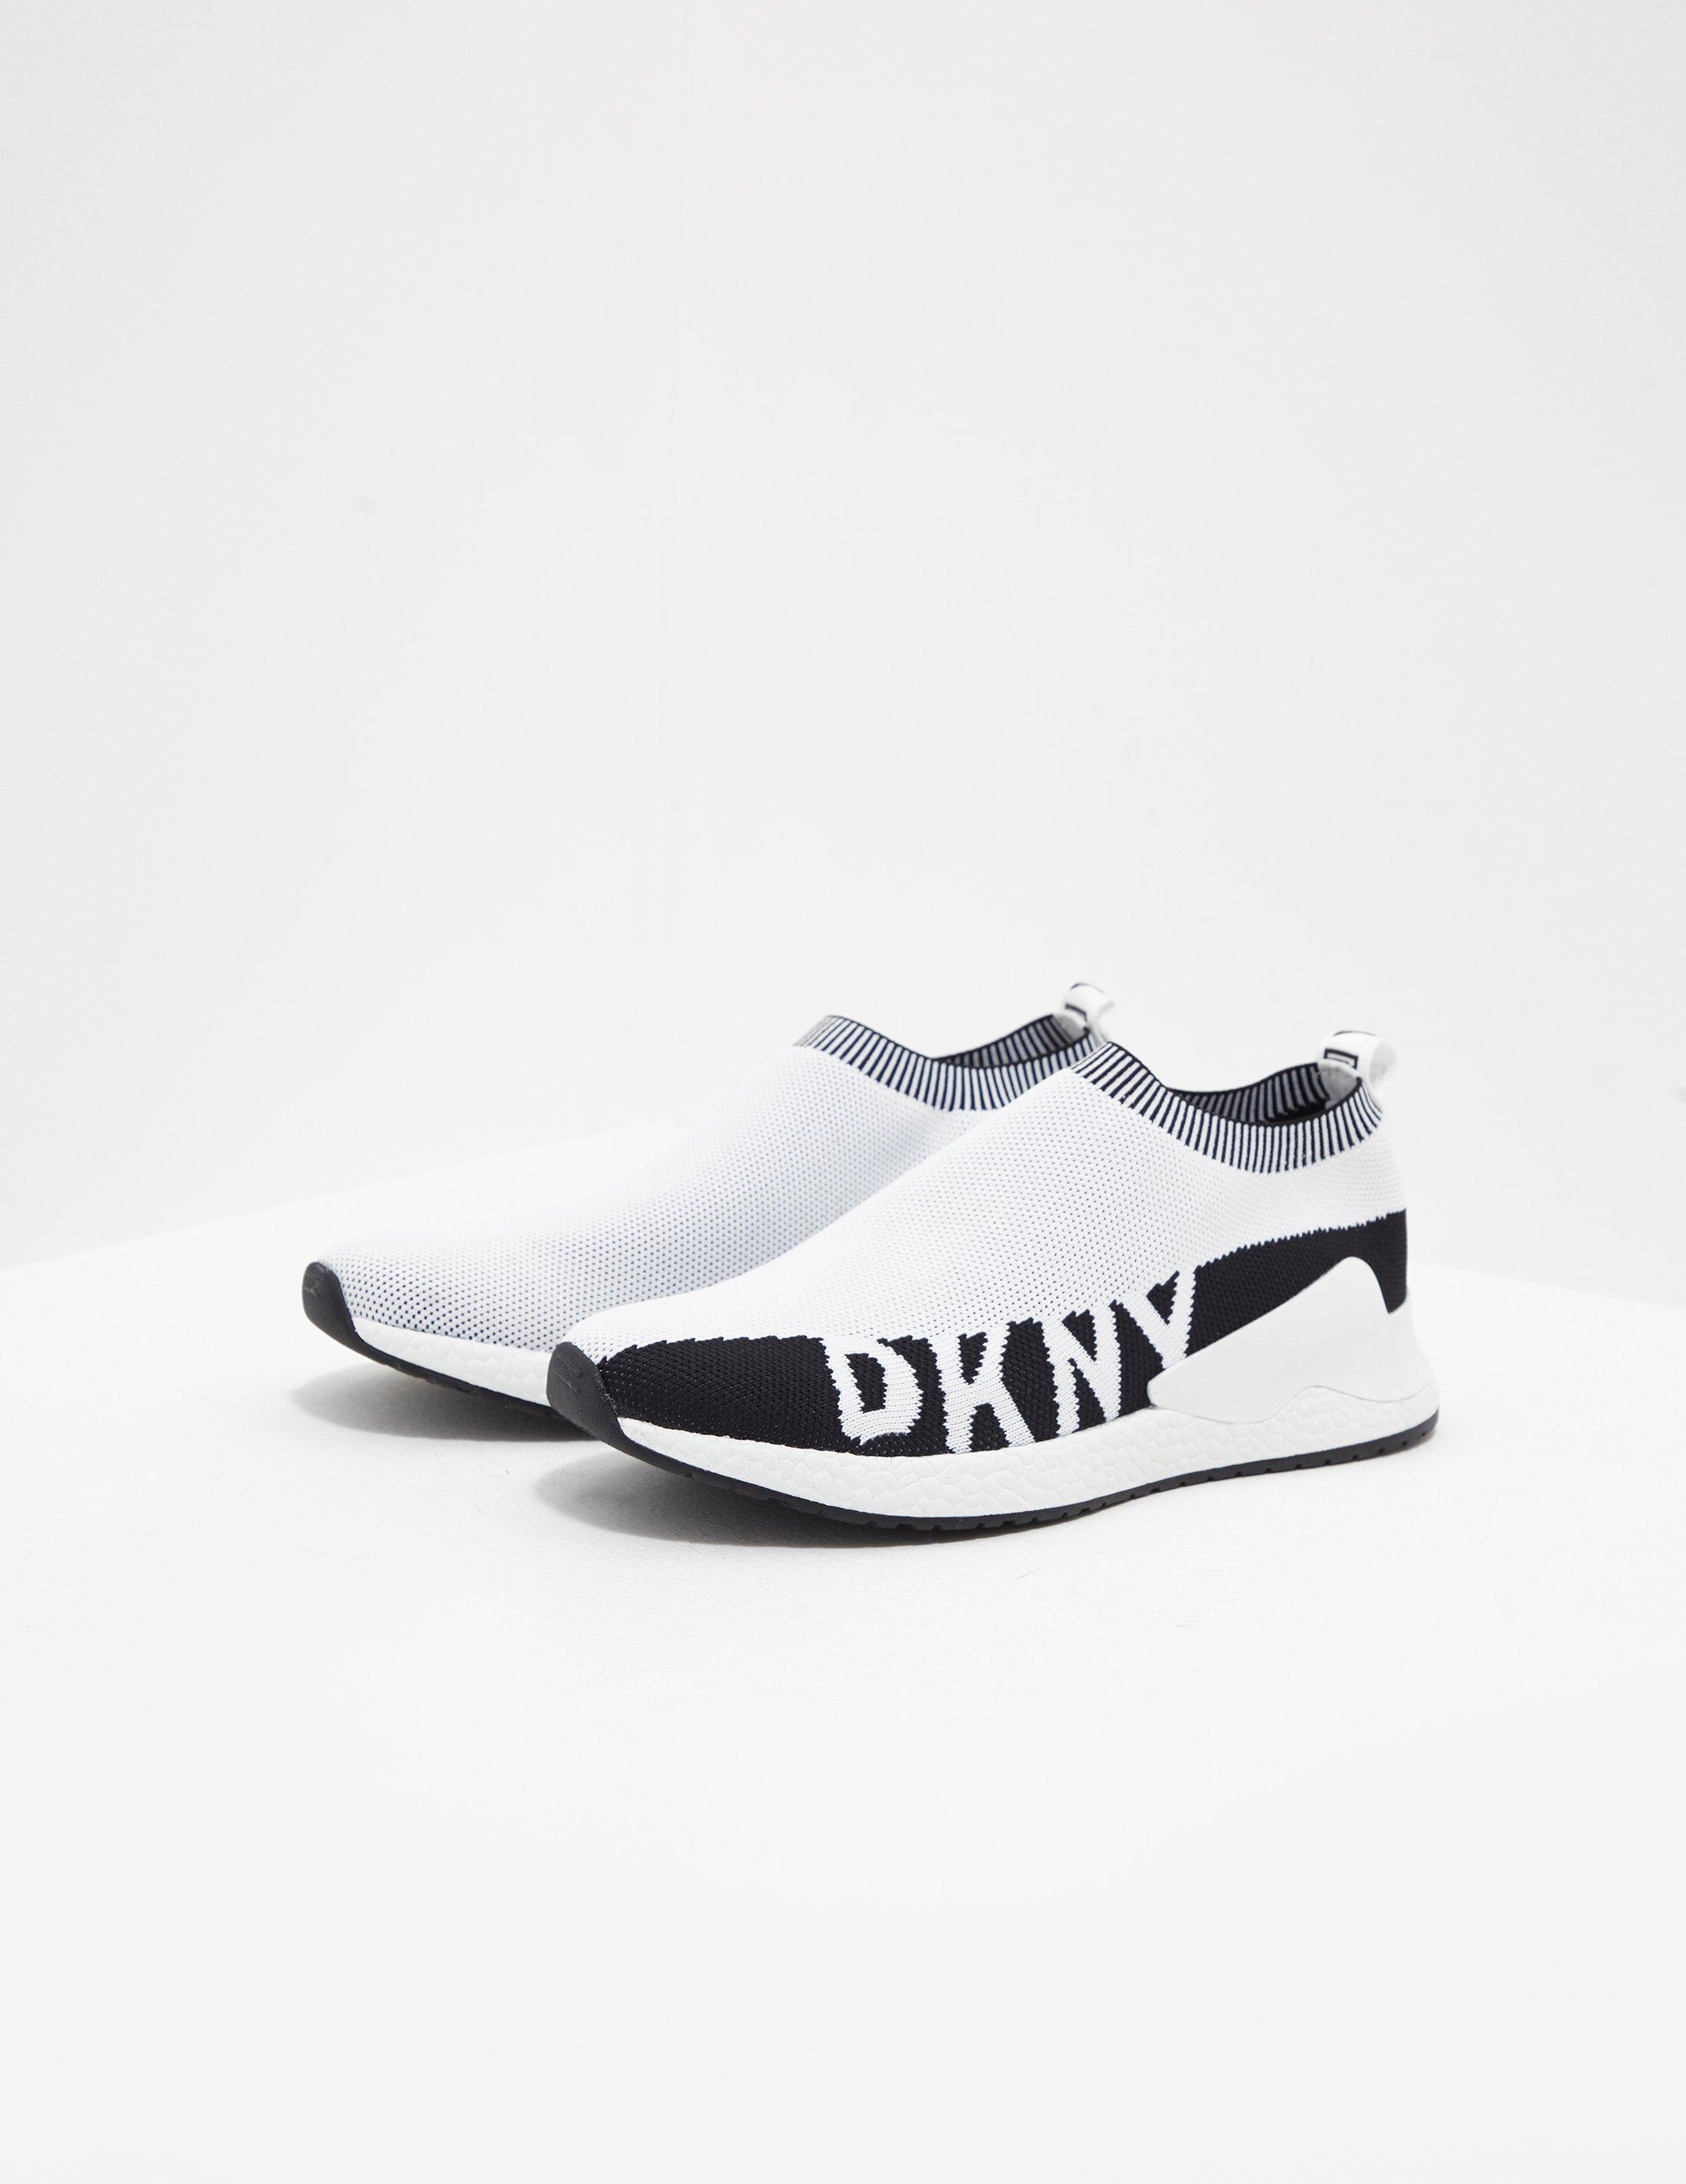 DKNY Rini Sock Trainers White - Lyst